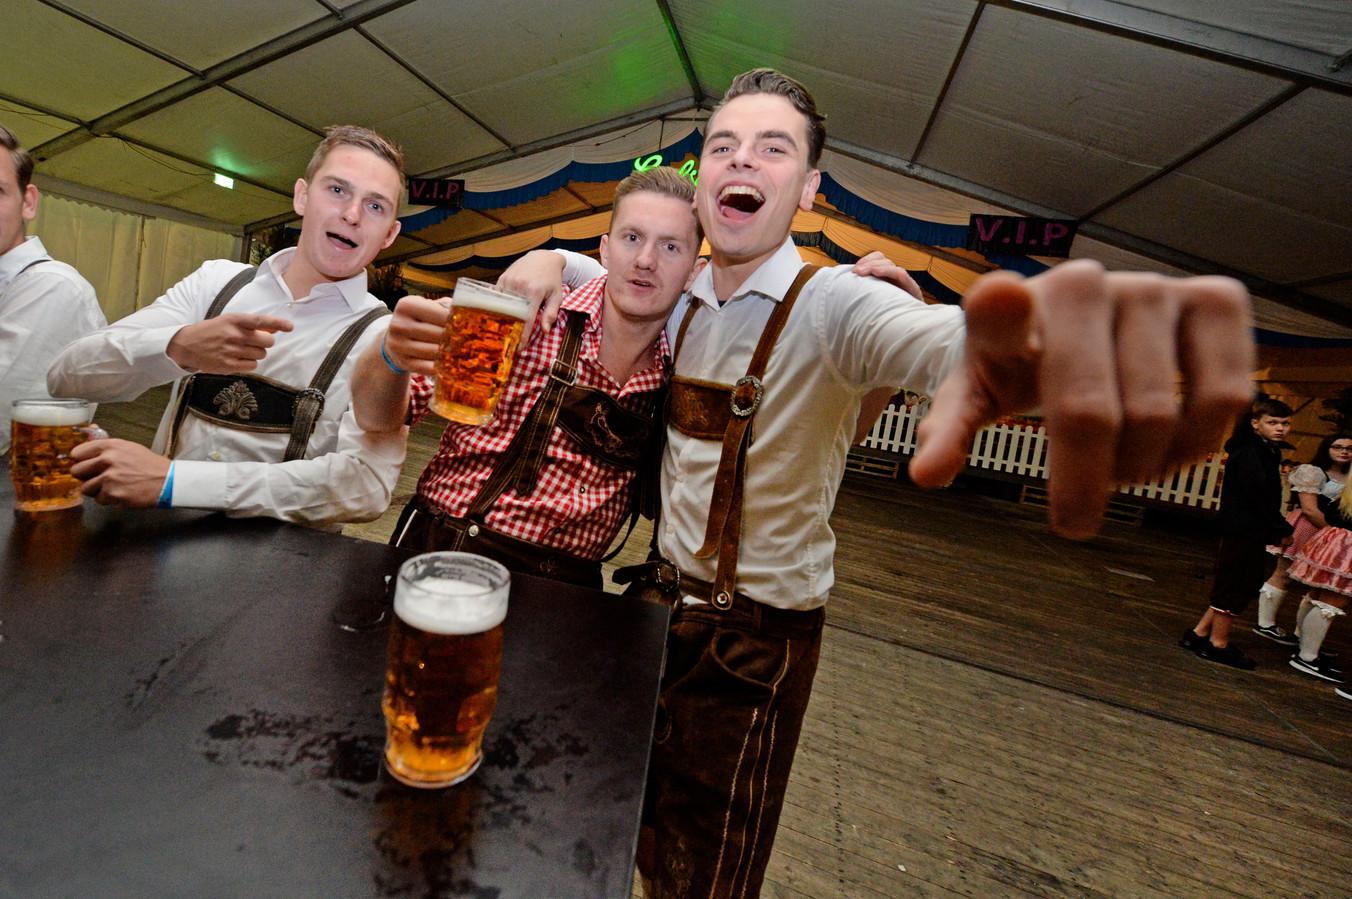 Lekker feesten in lederhosen op het Oktoberfest in Geerdijk.